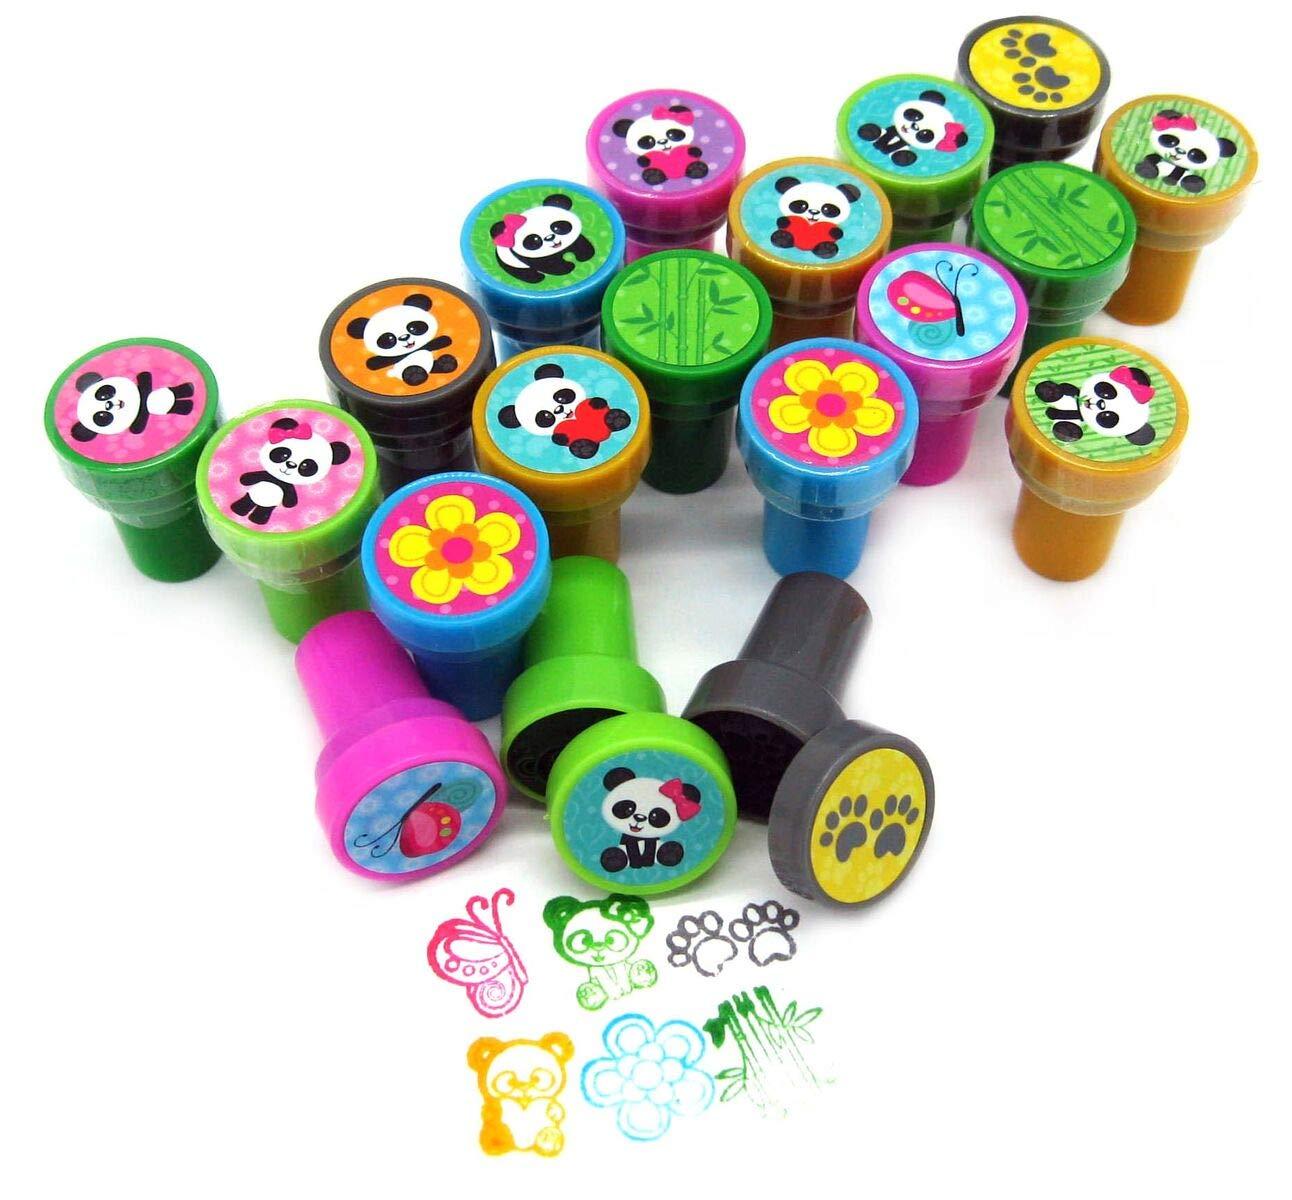 TINYMILLS 24 Pcs Panda Stampers for Kids